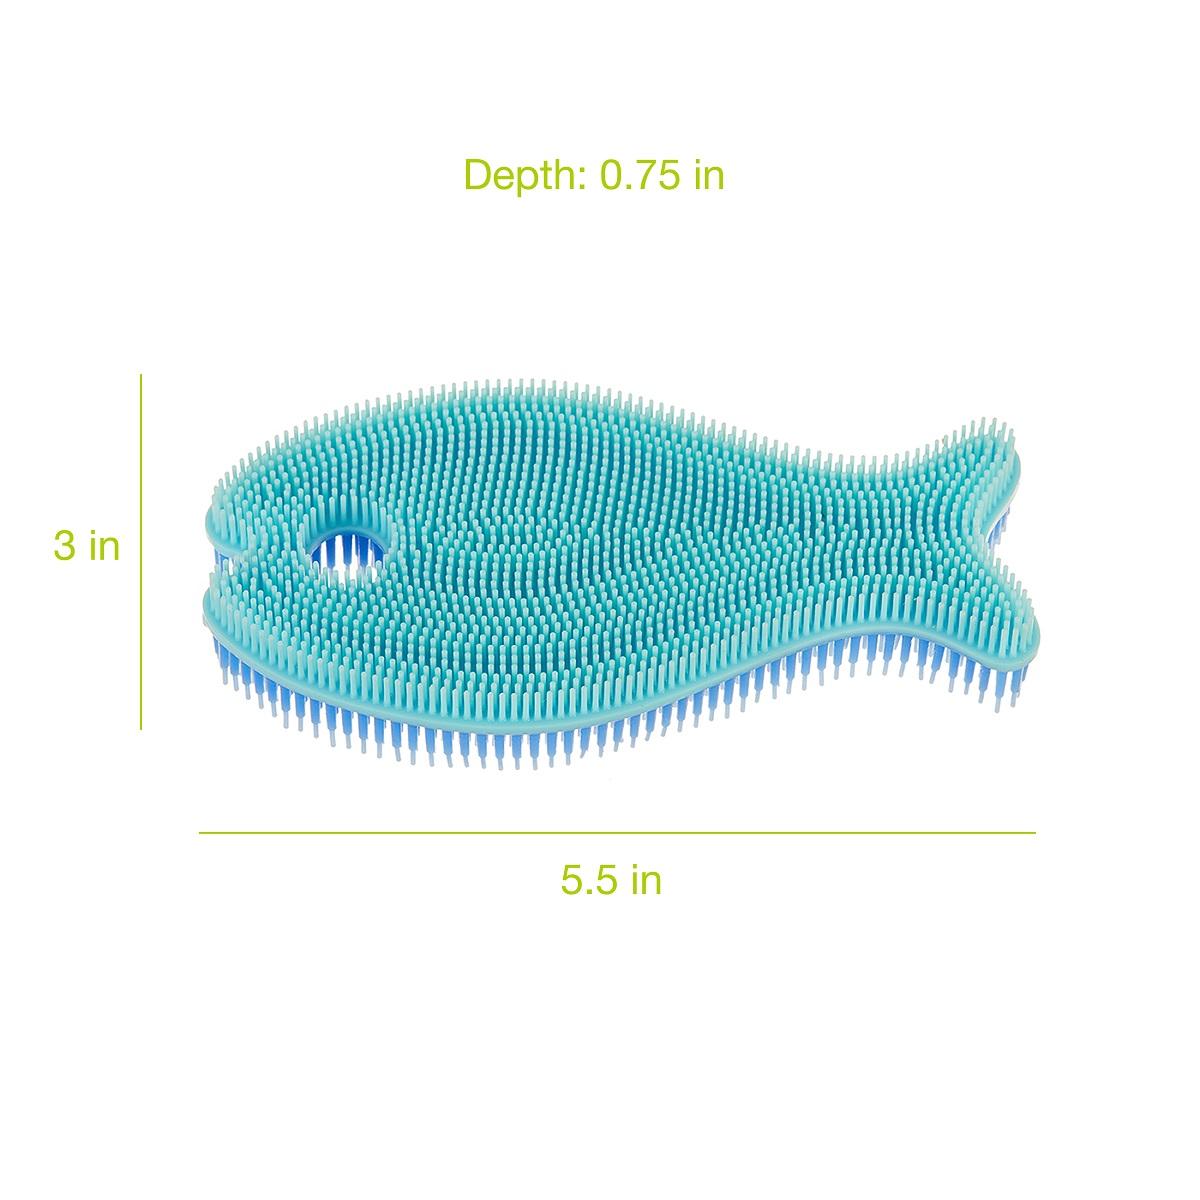 meausrement-fish-1-.jpg